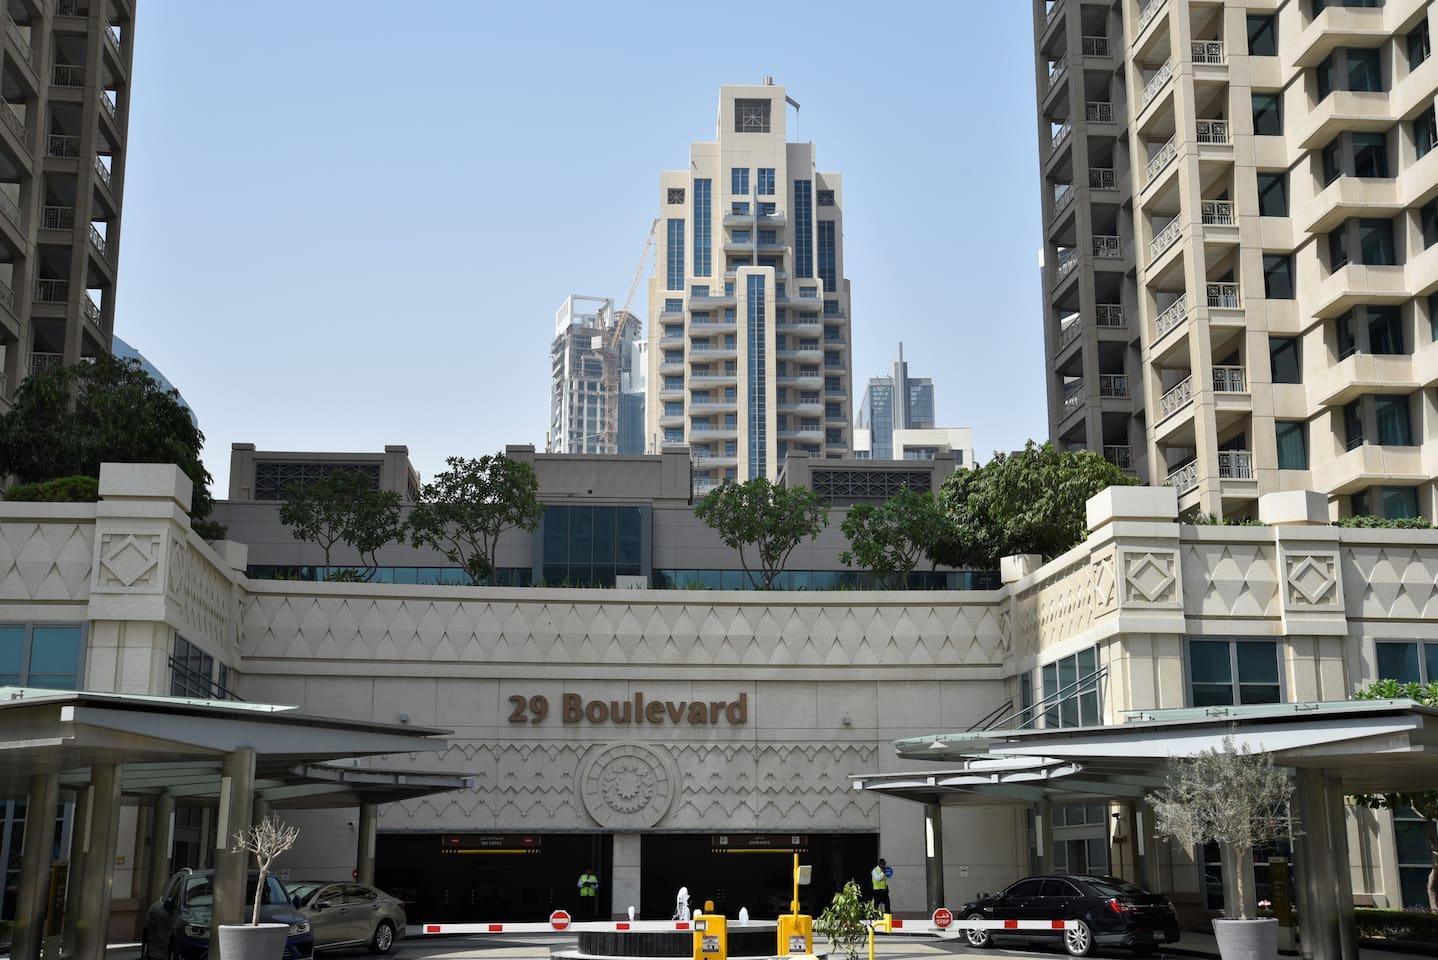 Main Entrance (Tower 2 entrance on left side)